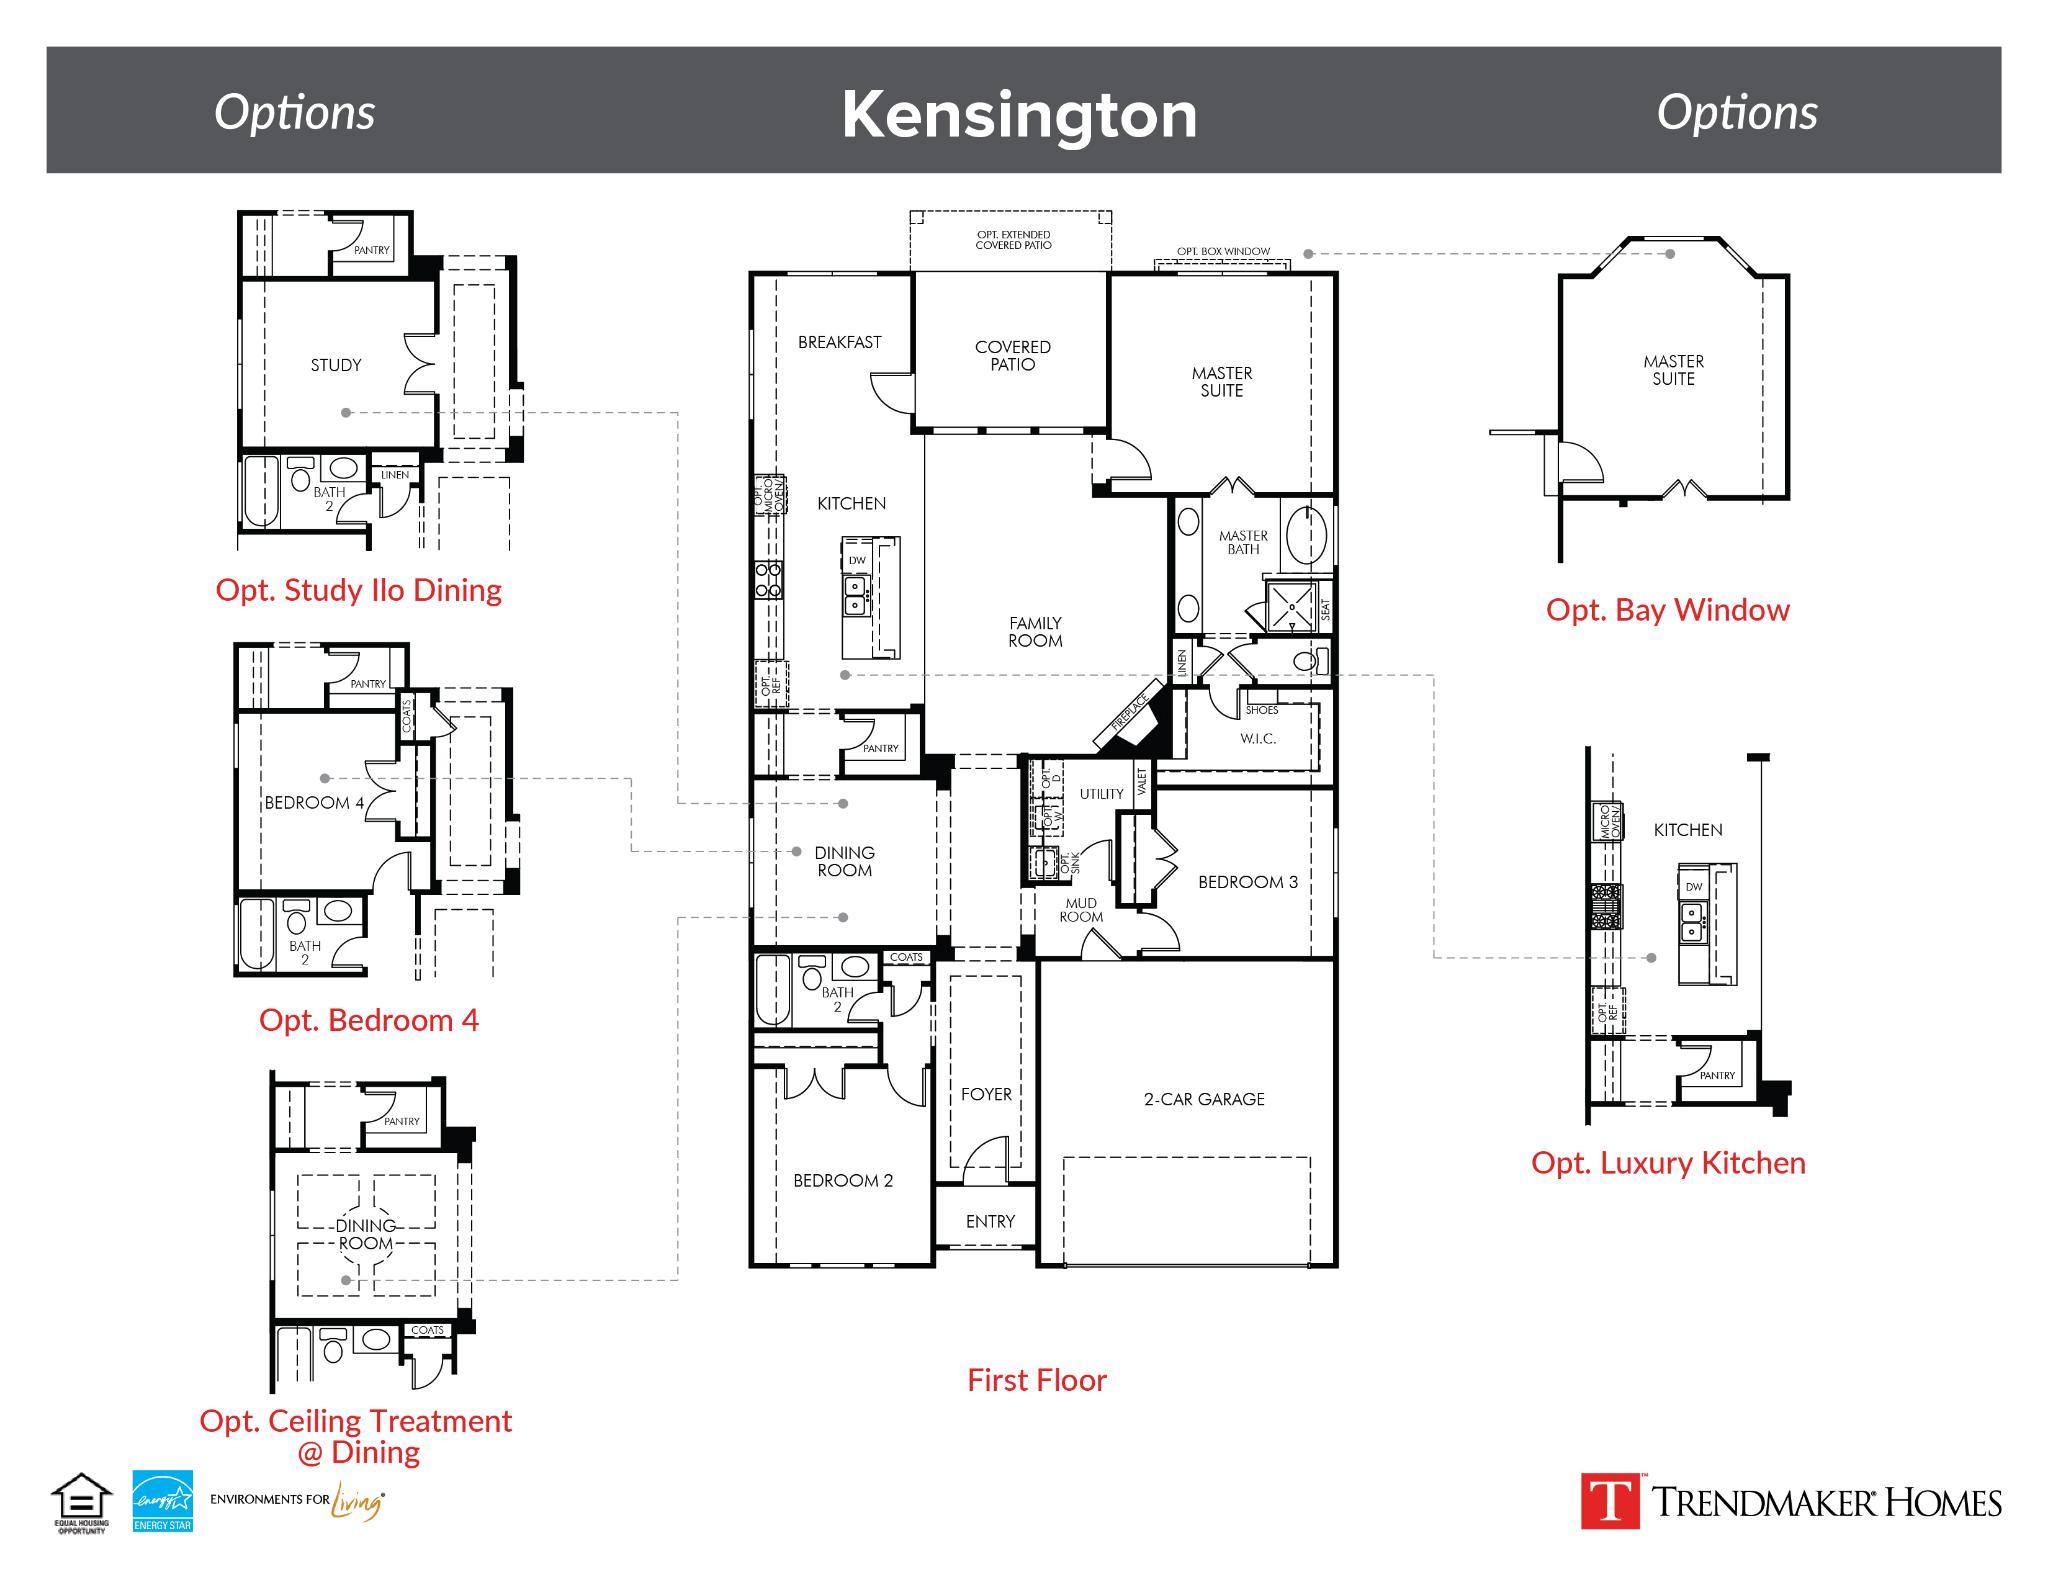 Kensington - Ventana